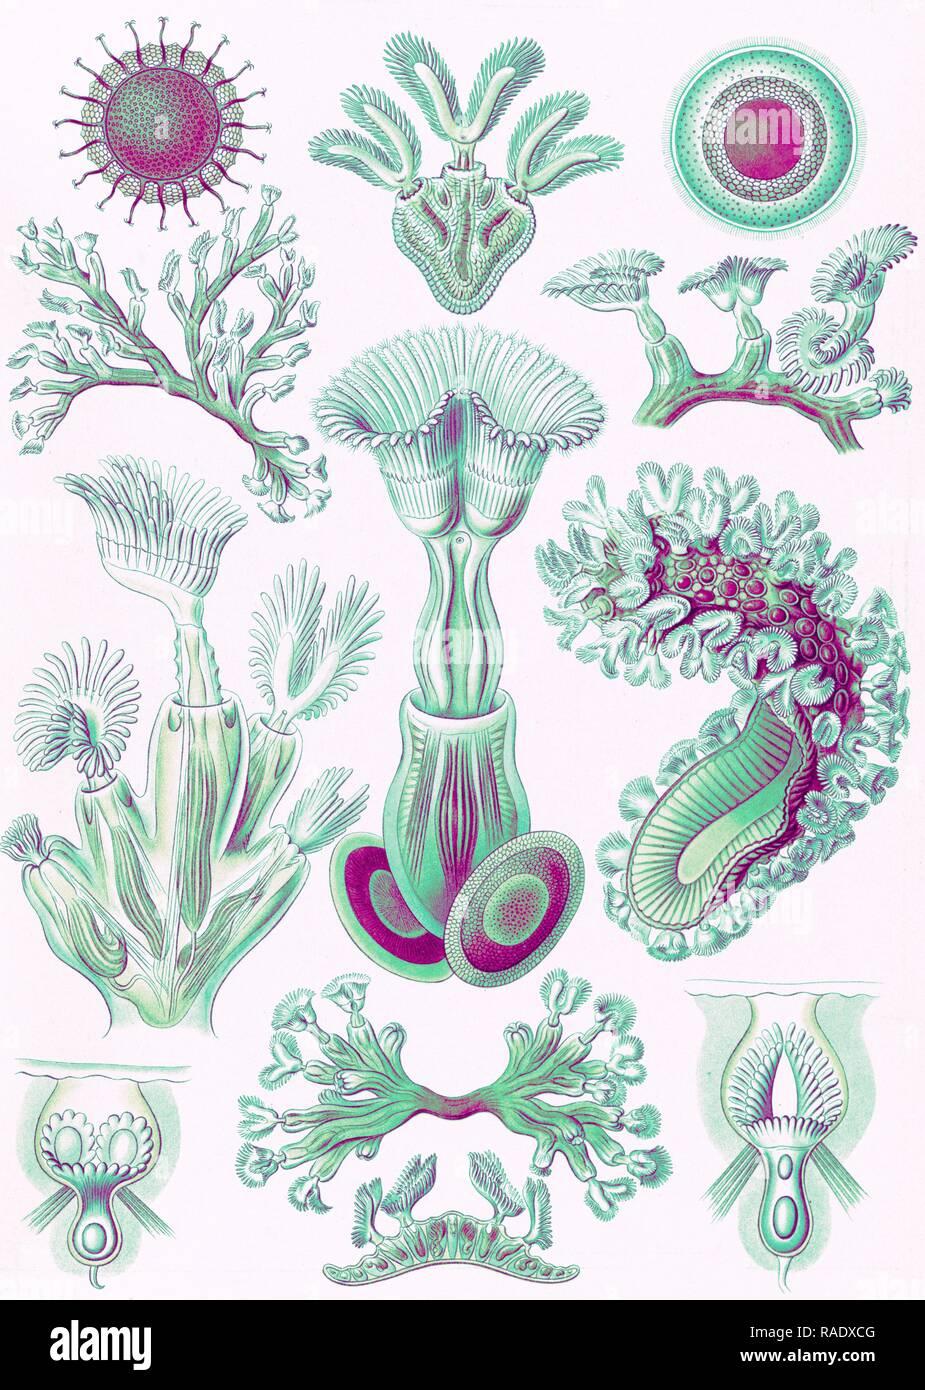 Illustration shows aquatic invertebrates. Bryozoa. - Moostiere, 1 print : color lithograph , sheet 36 x 26 cm., 1904 reimagined Stock Photo